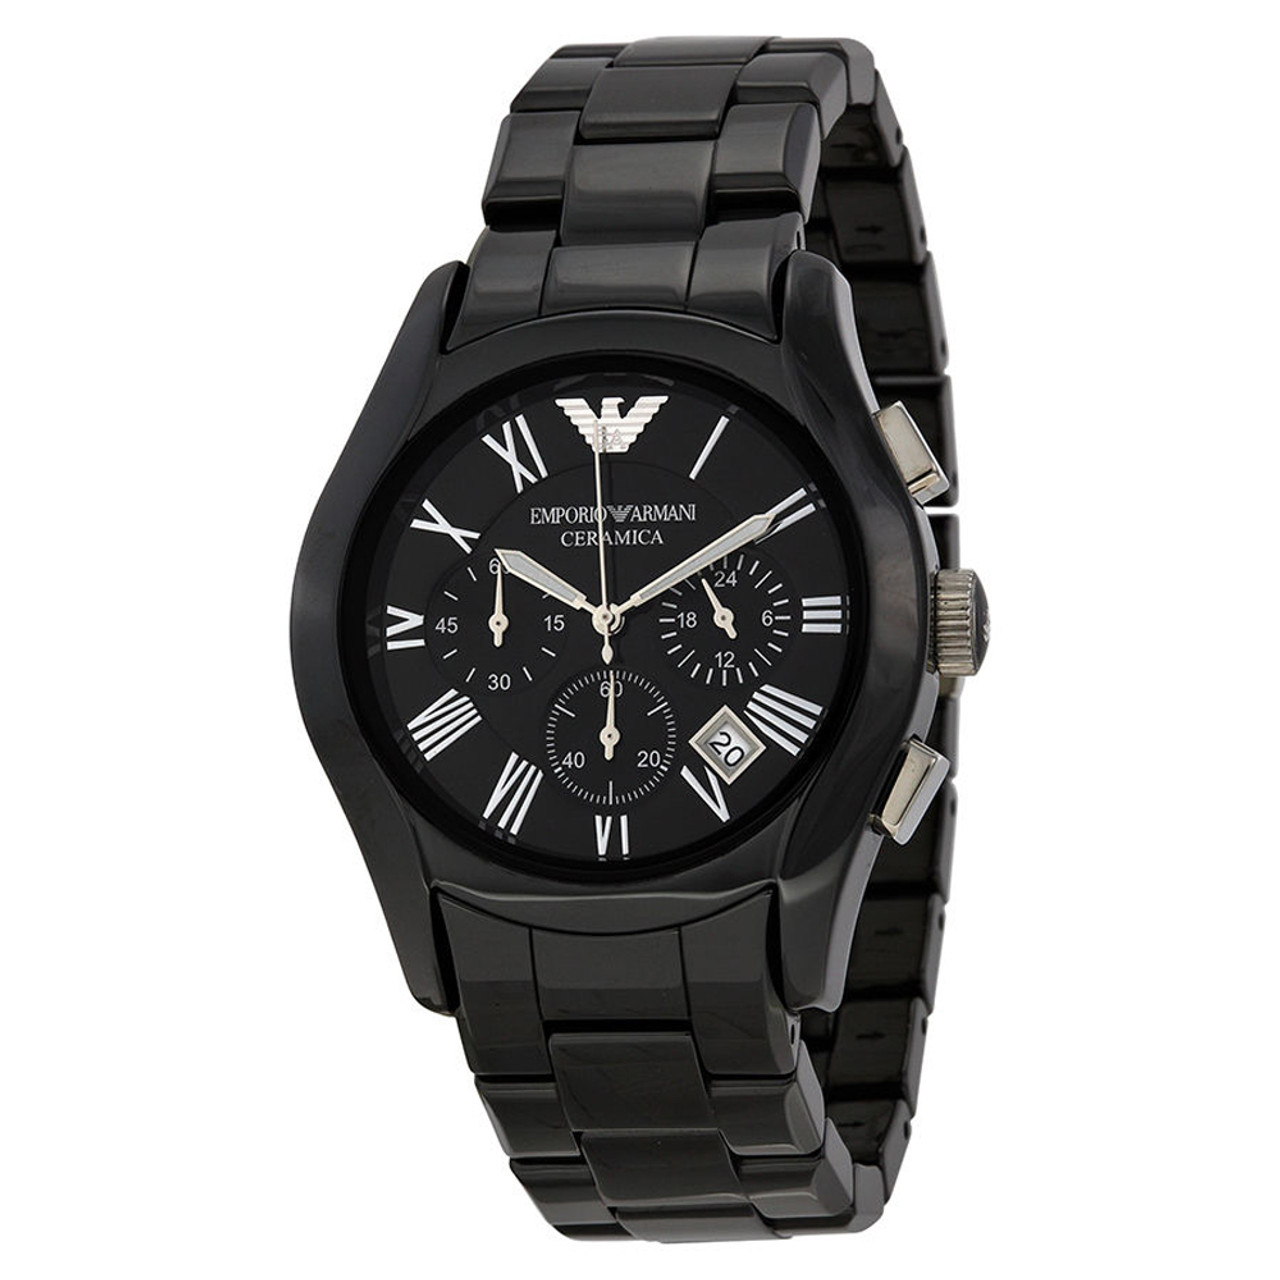 Emporio armani ar1400 black ceramic chronograph mens watch the royal gift inc for Ceramic man watch